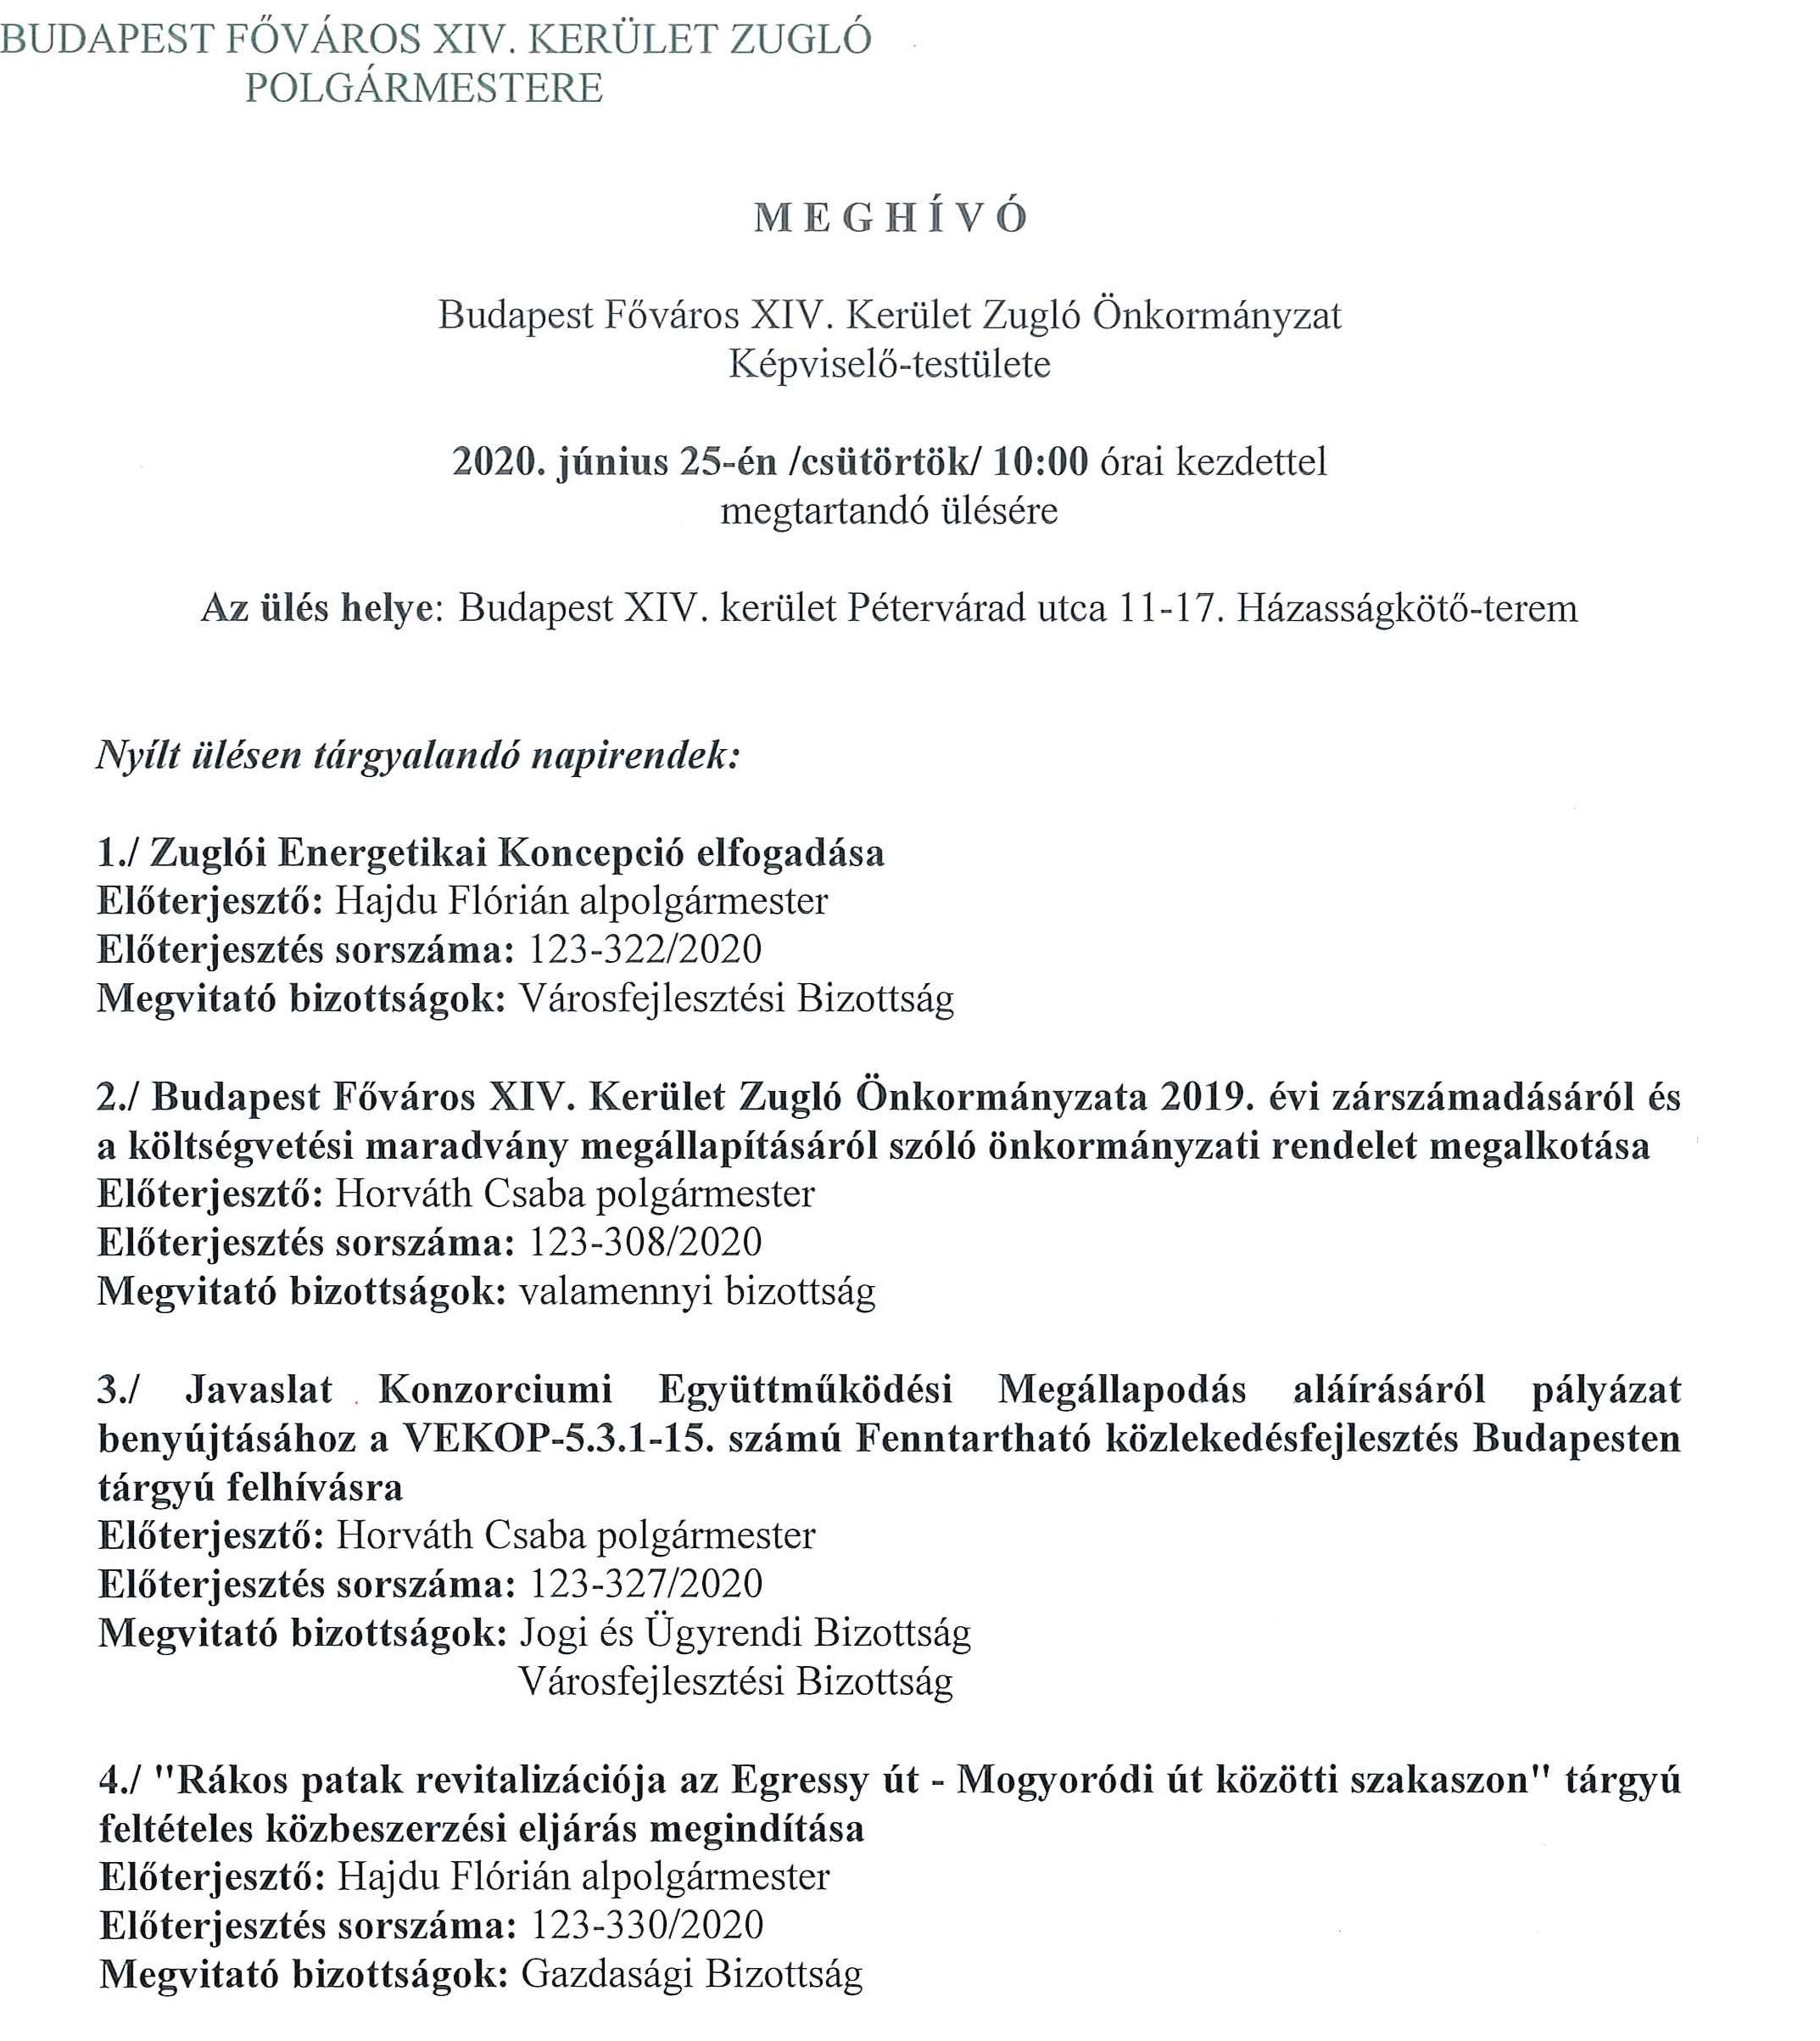 kt_meghivo_2020-6-25_1_-1.jpg